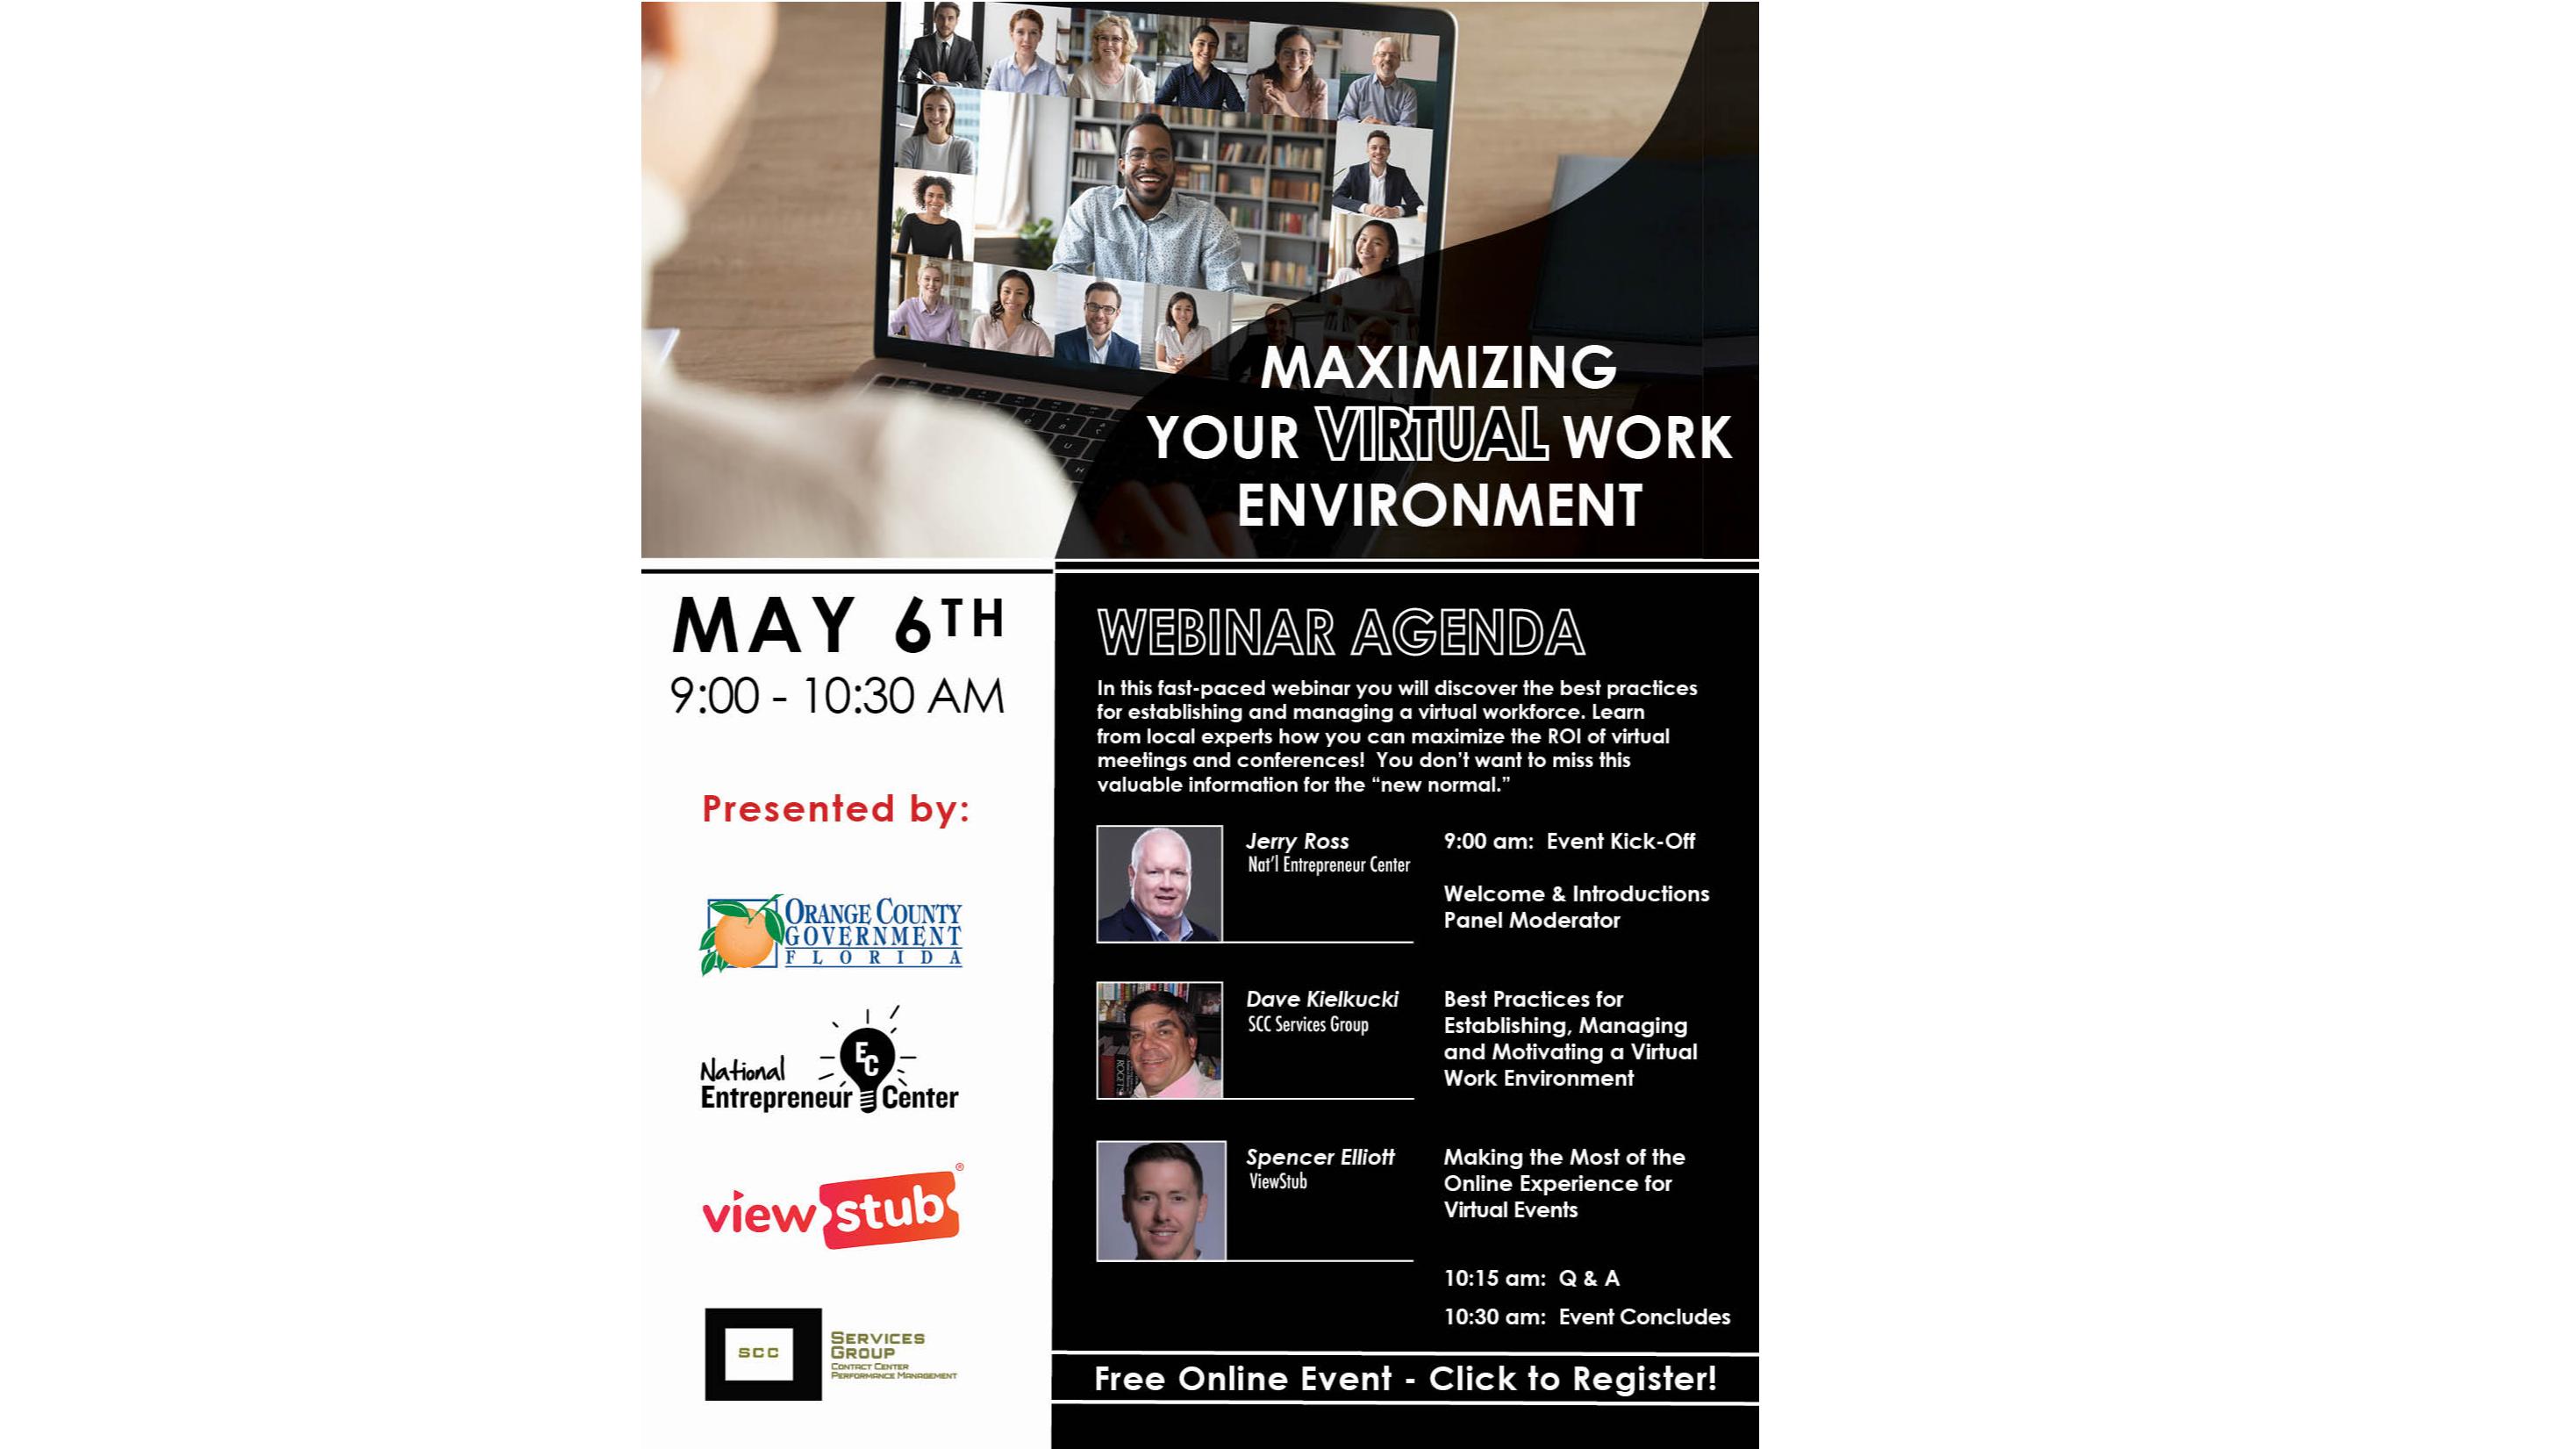 Photo forMaximizing Your Virtual Work Environment on ViewStub